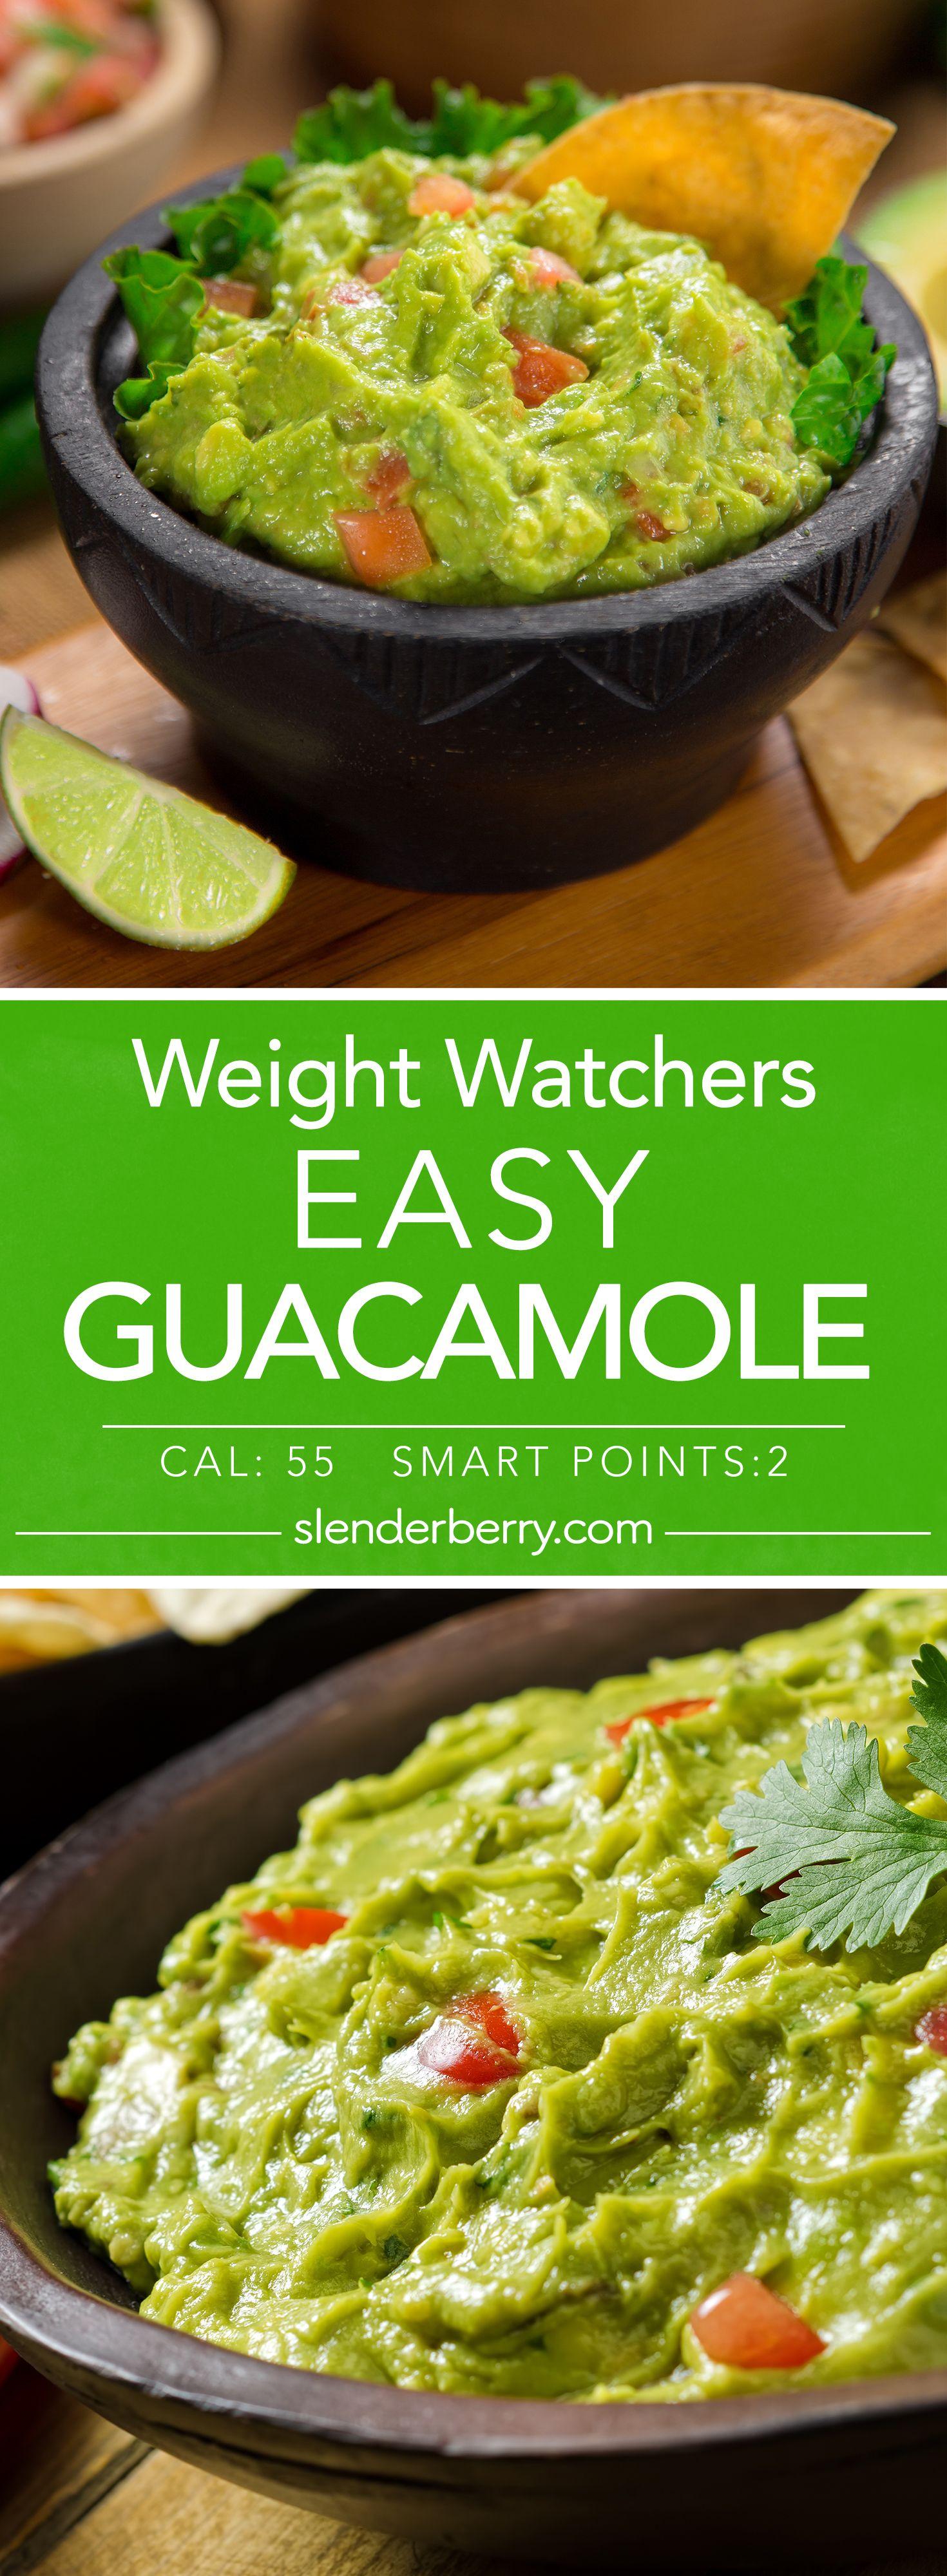 Easy Guacamole - Slenderberry